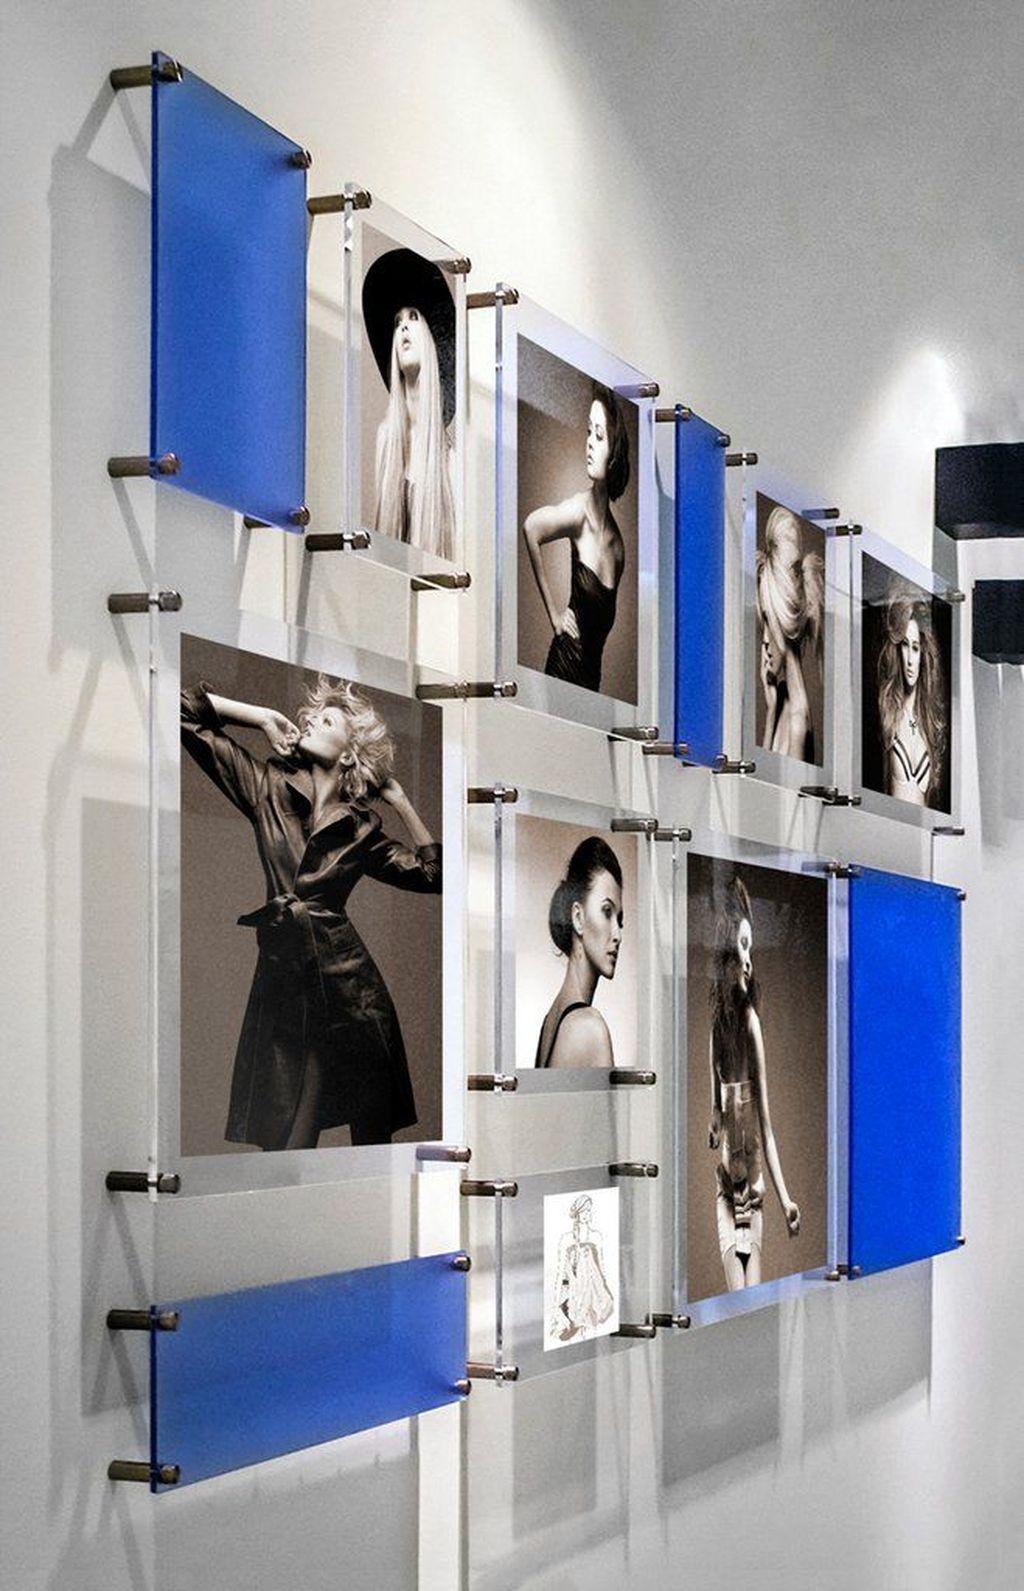 The Best Office Artwork Design Ideas 18